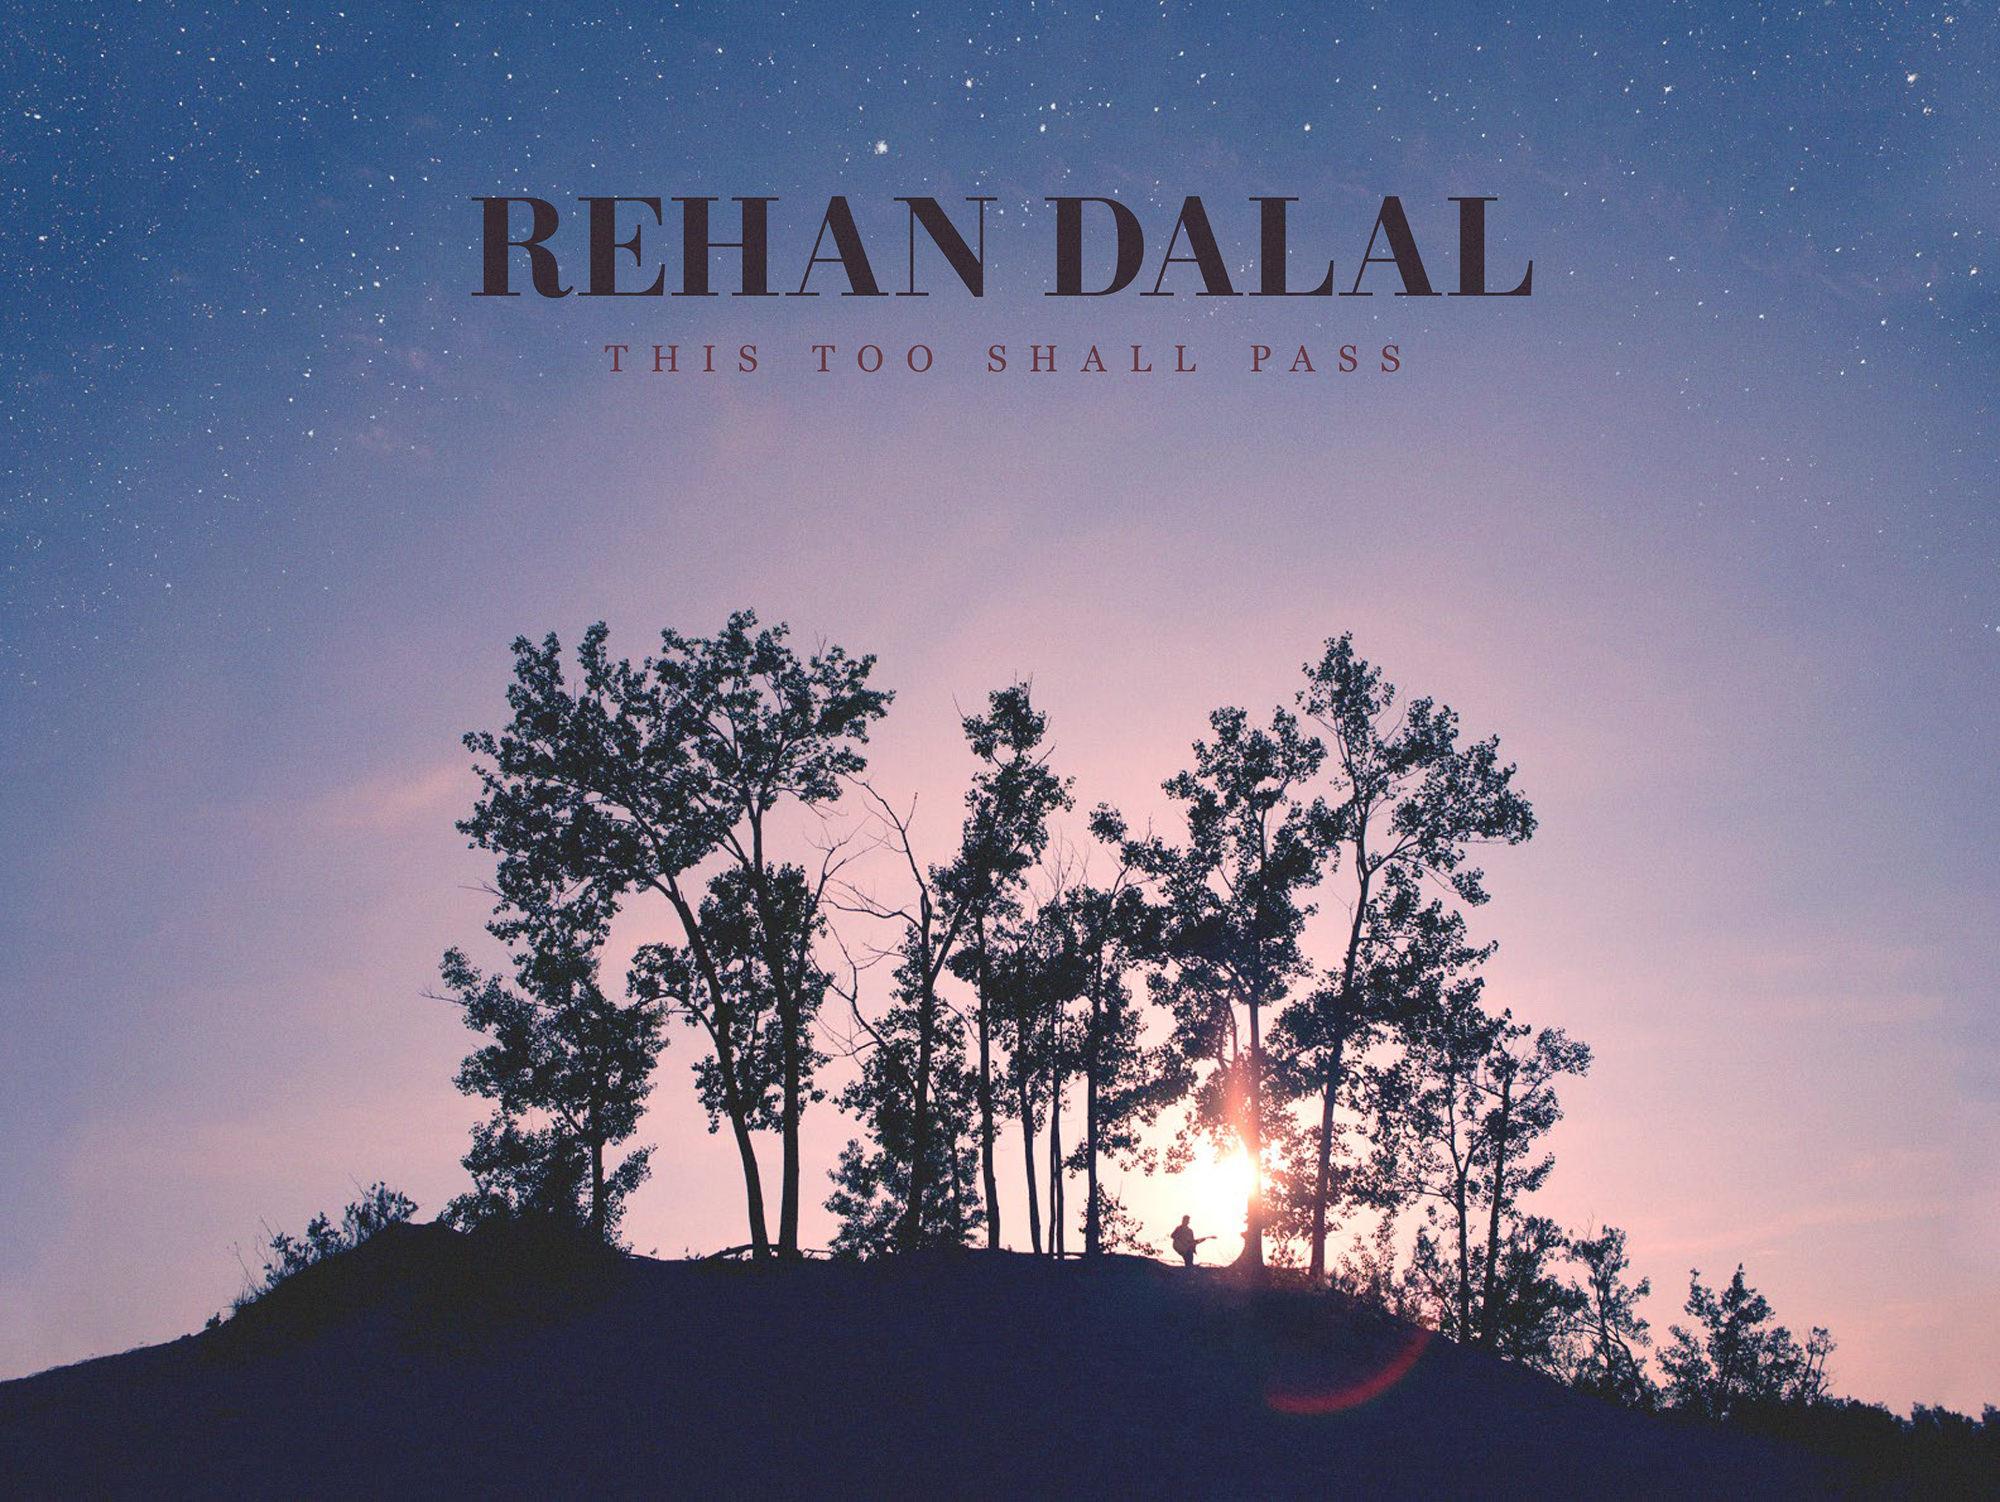 rehan-dalal-album-cover-this-too-shall-pass.jpg